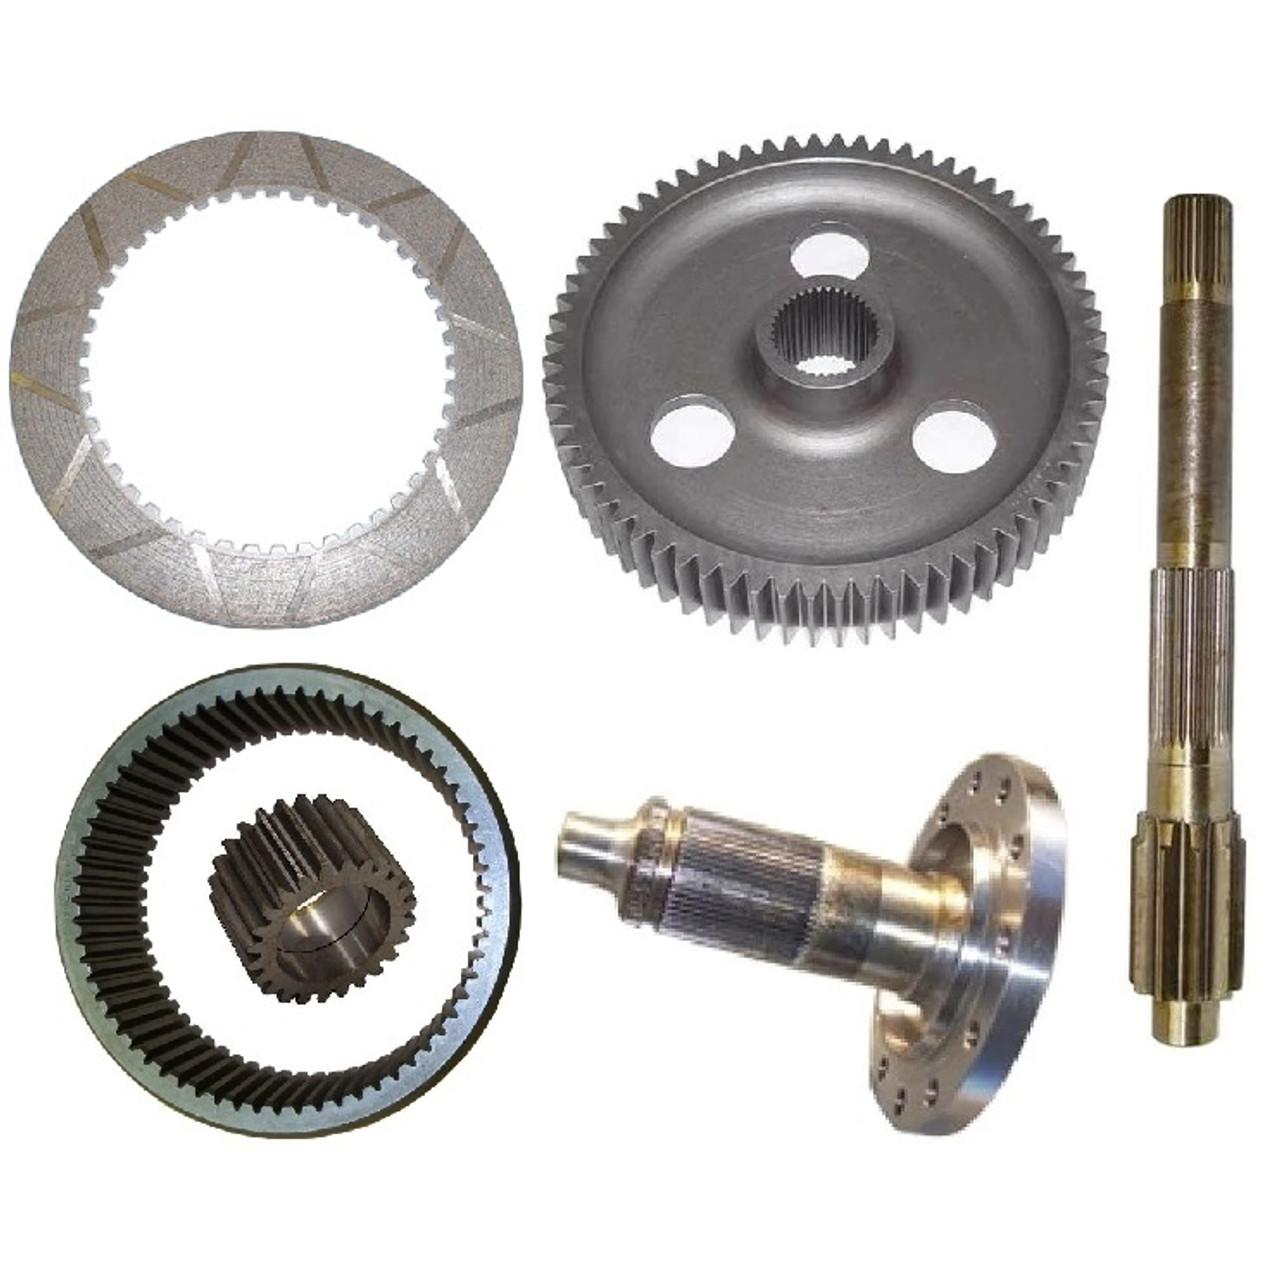 Dresser & International Harvester Parts | Dozer Parts at